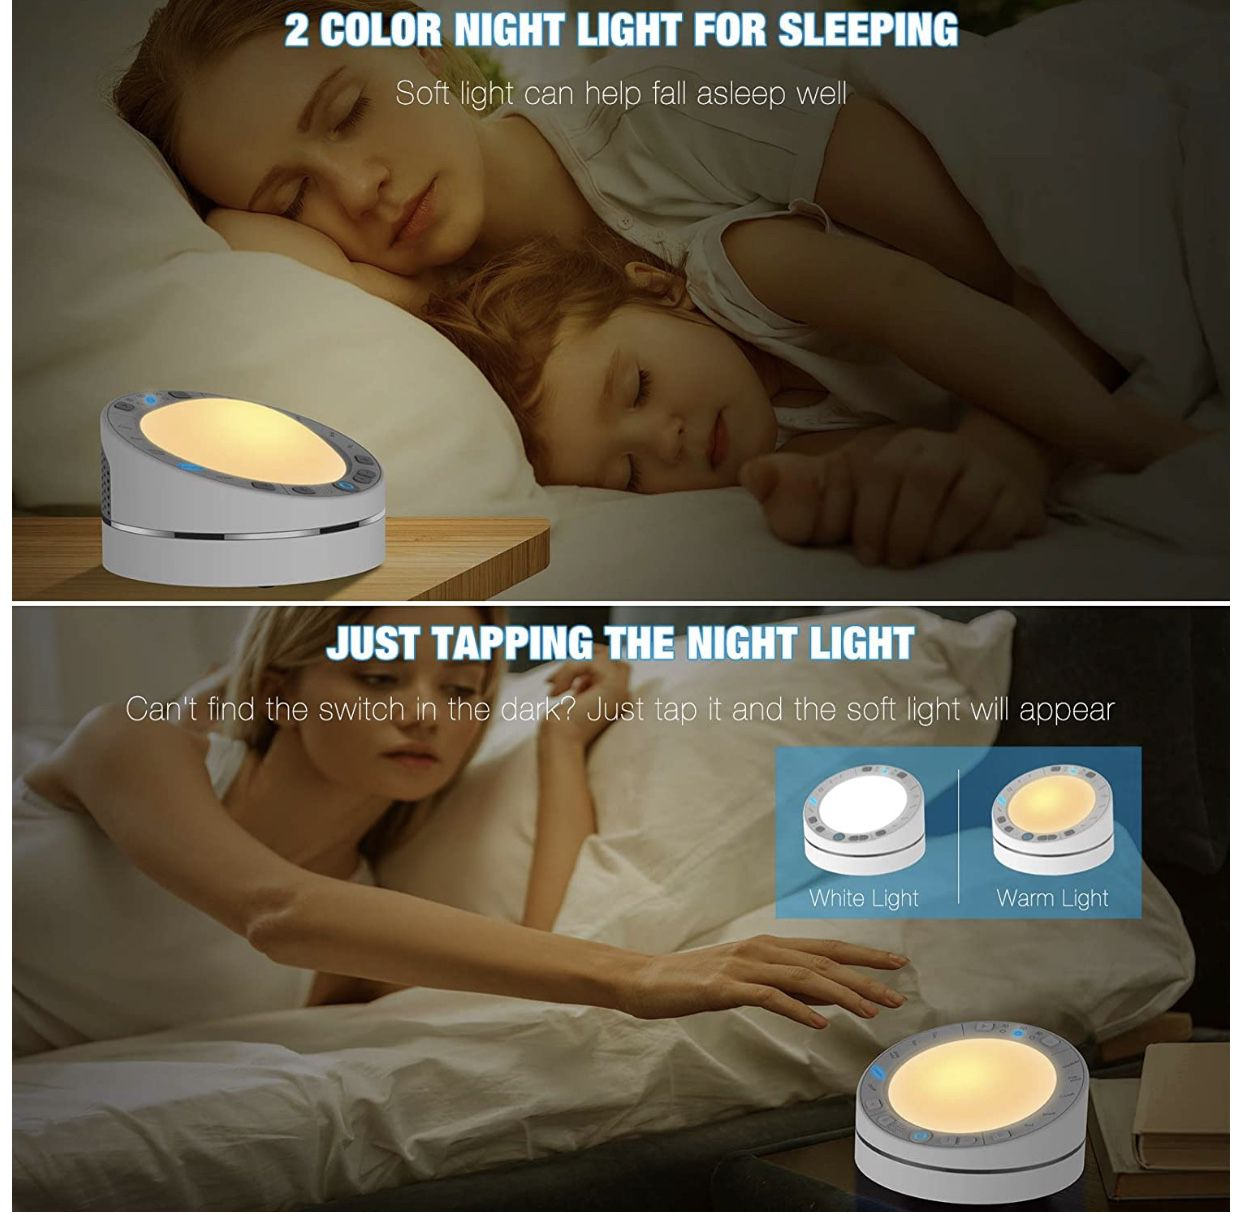 Brand New White Noise Machine for Sleeping